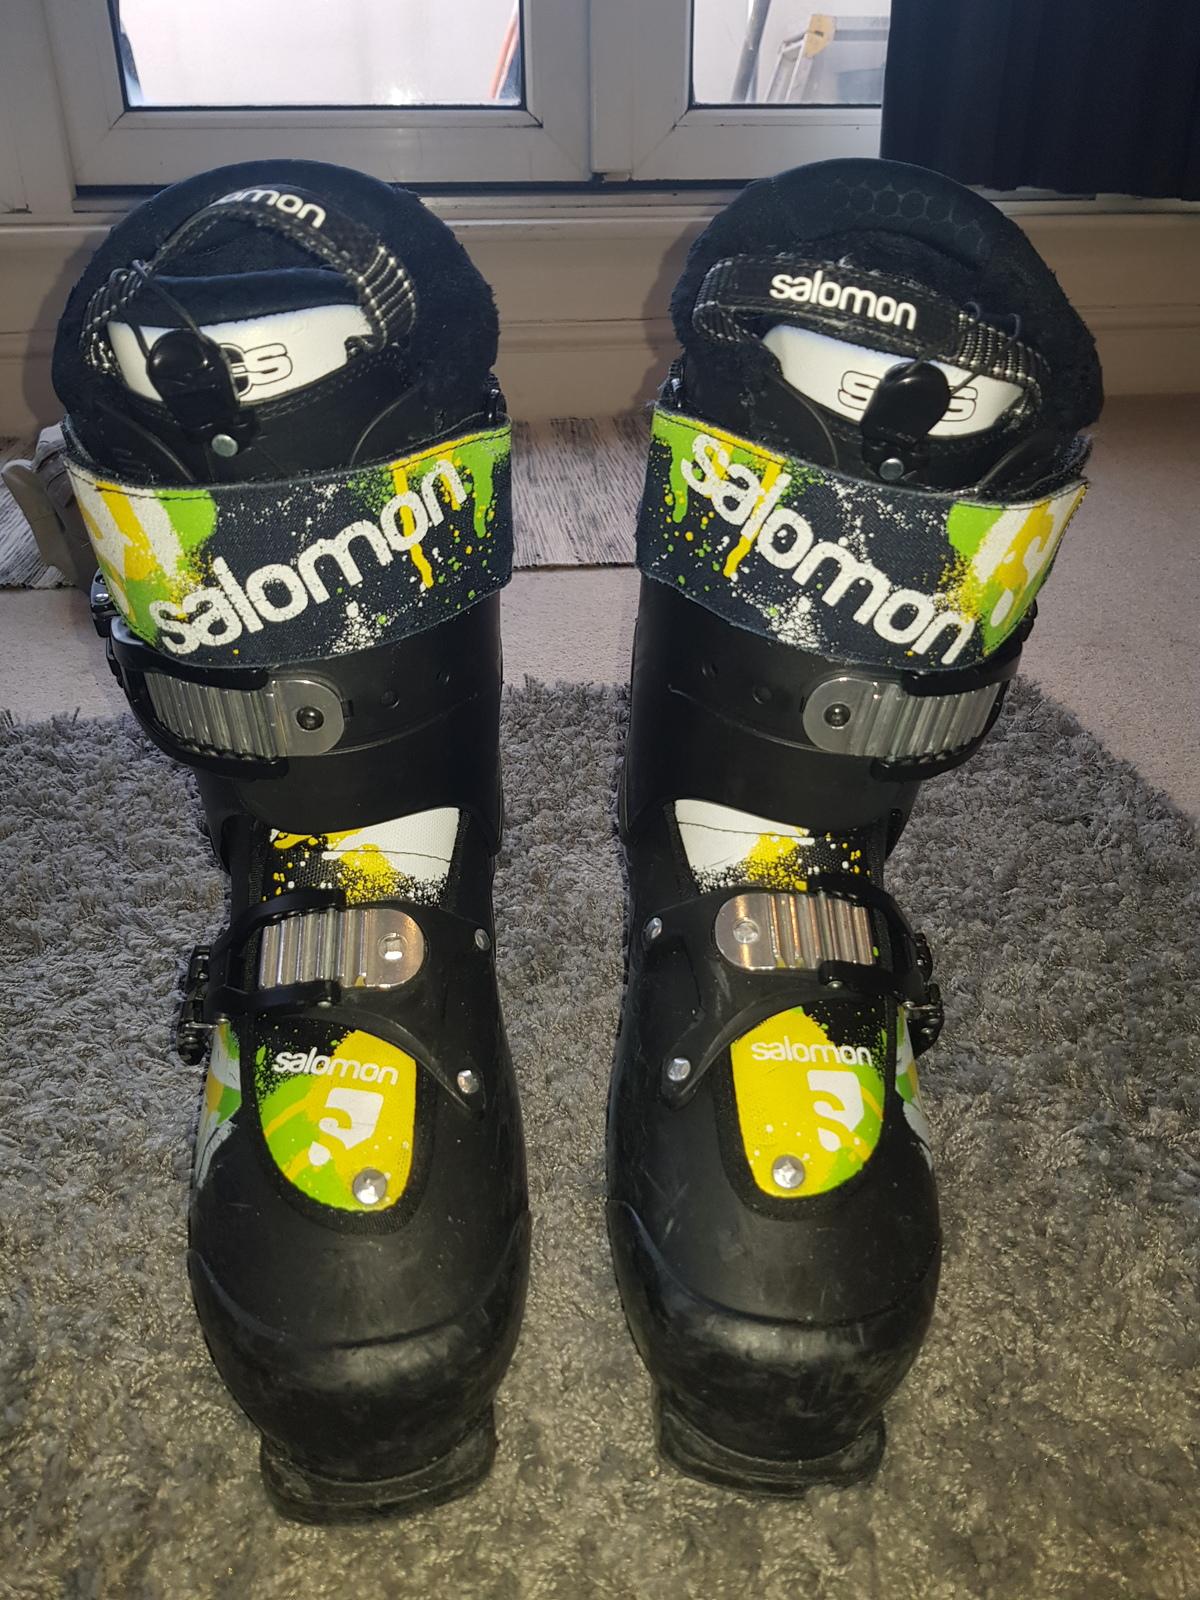 Salomon SPK85 27.5 freestyle boots